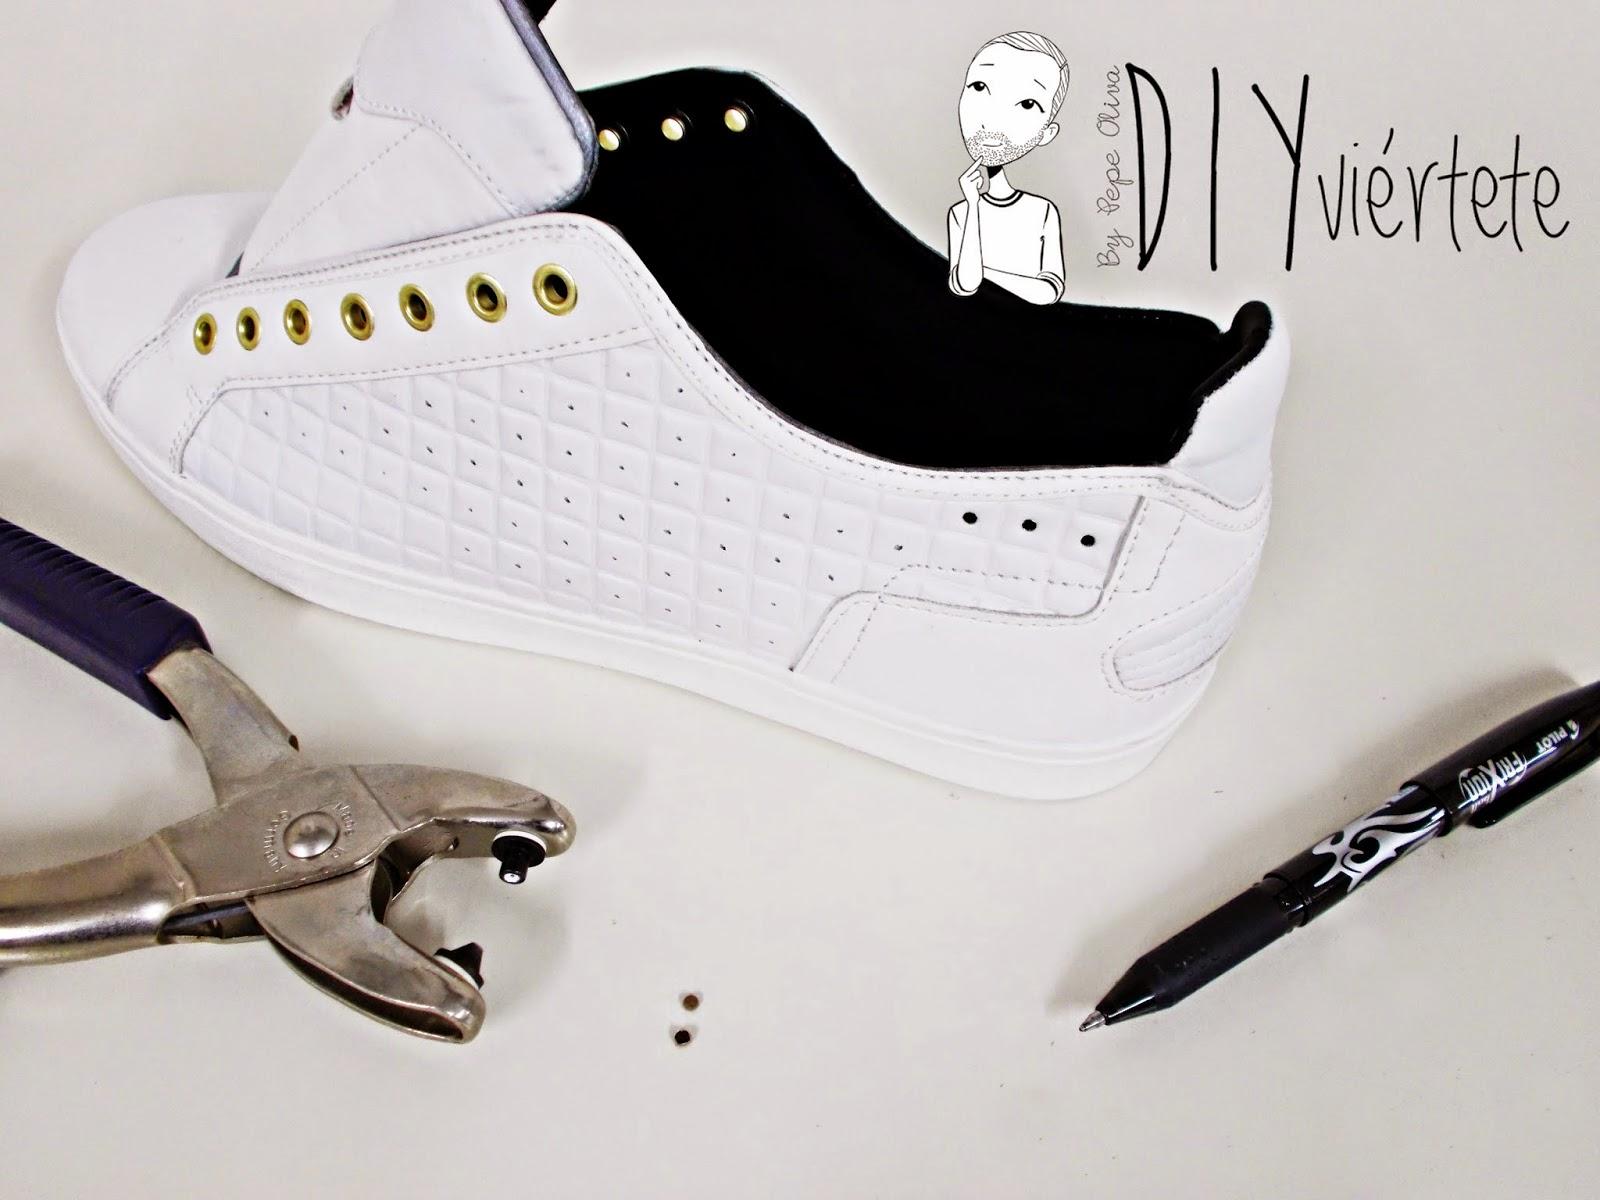 DIY-zapatillas-tunear-customizar-CHRISTIAN-LOUBOUTIN-zapatos-pinchos-esmaltes-pinta uñas-colores-7